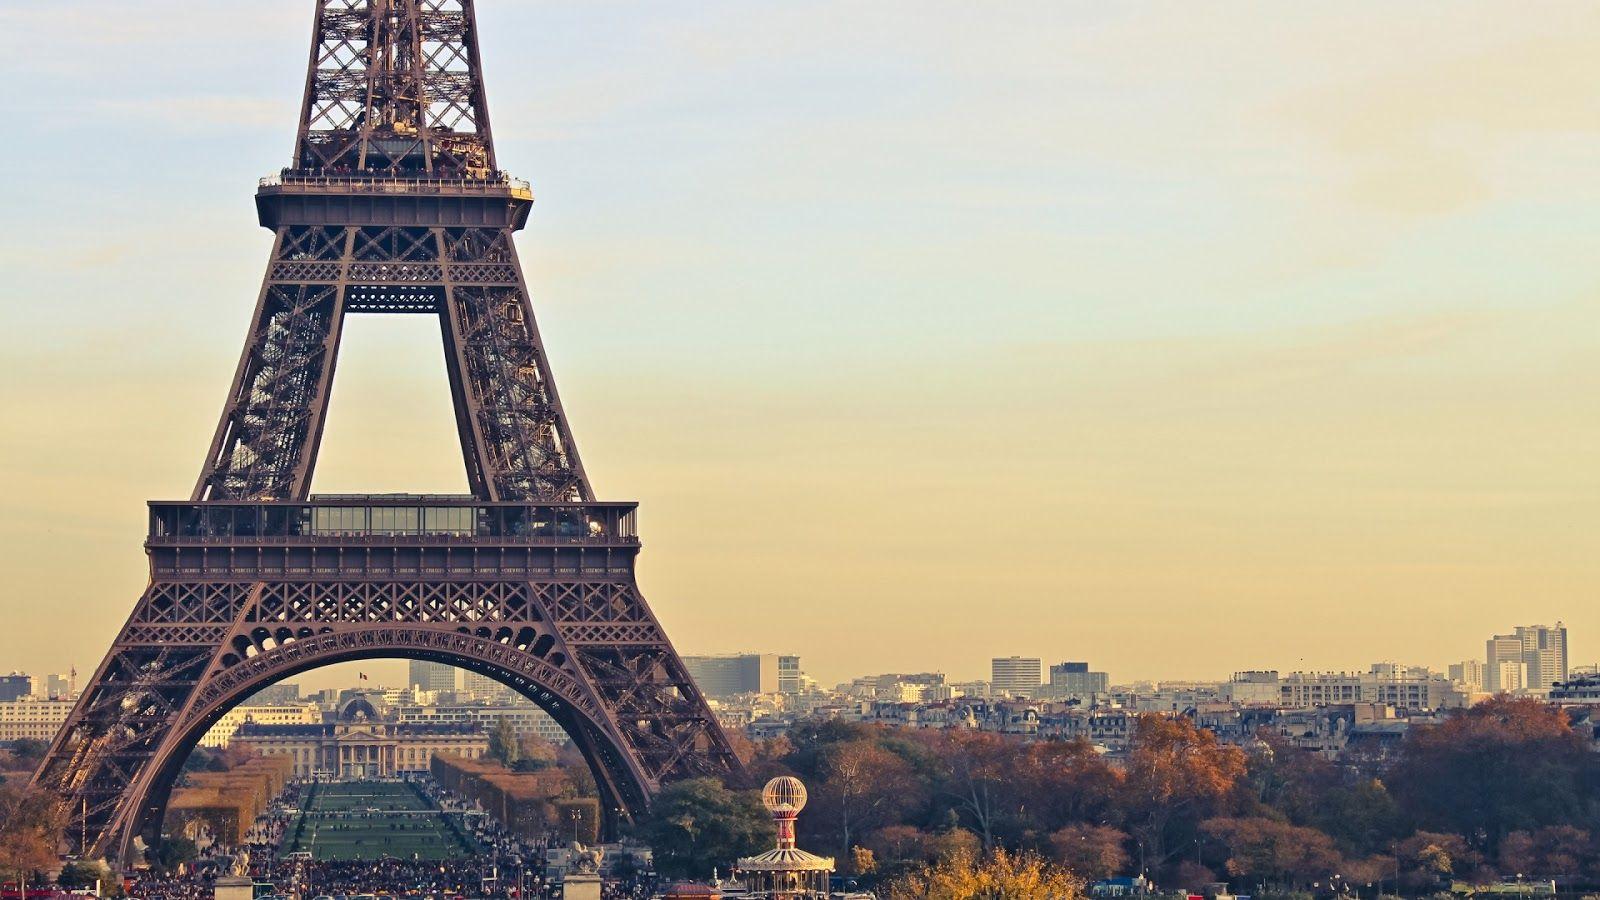 France Eiffel Tower Tumblr - wallpaper. | Paris wallpaper ...